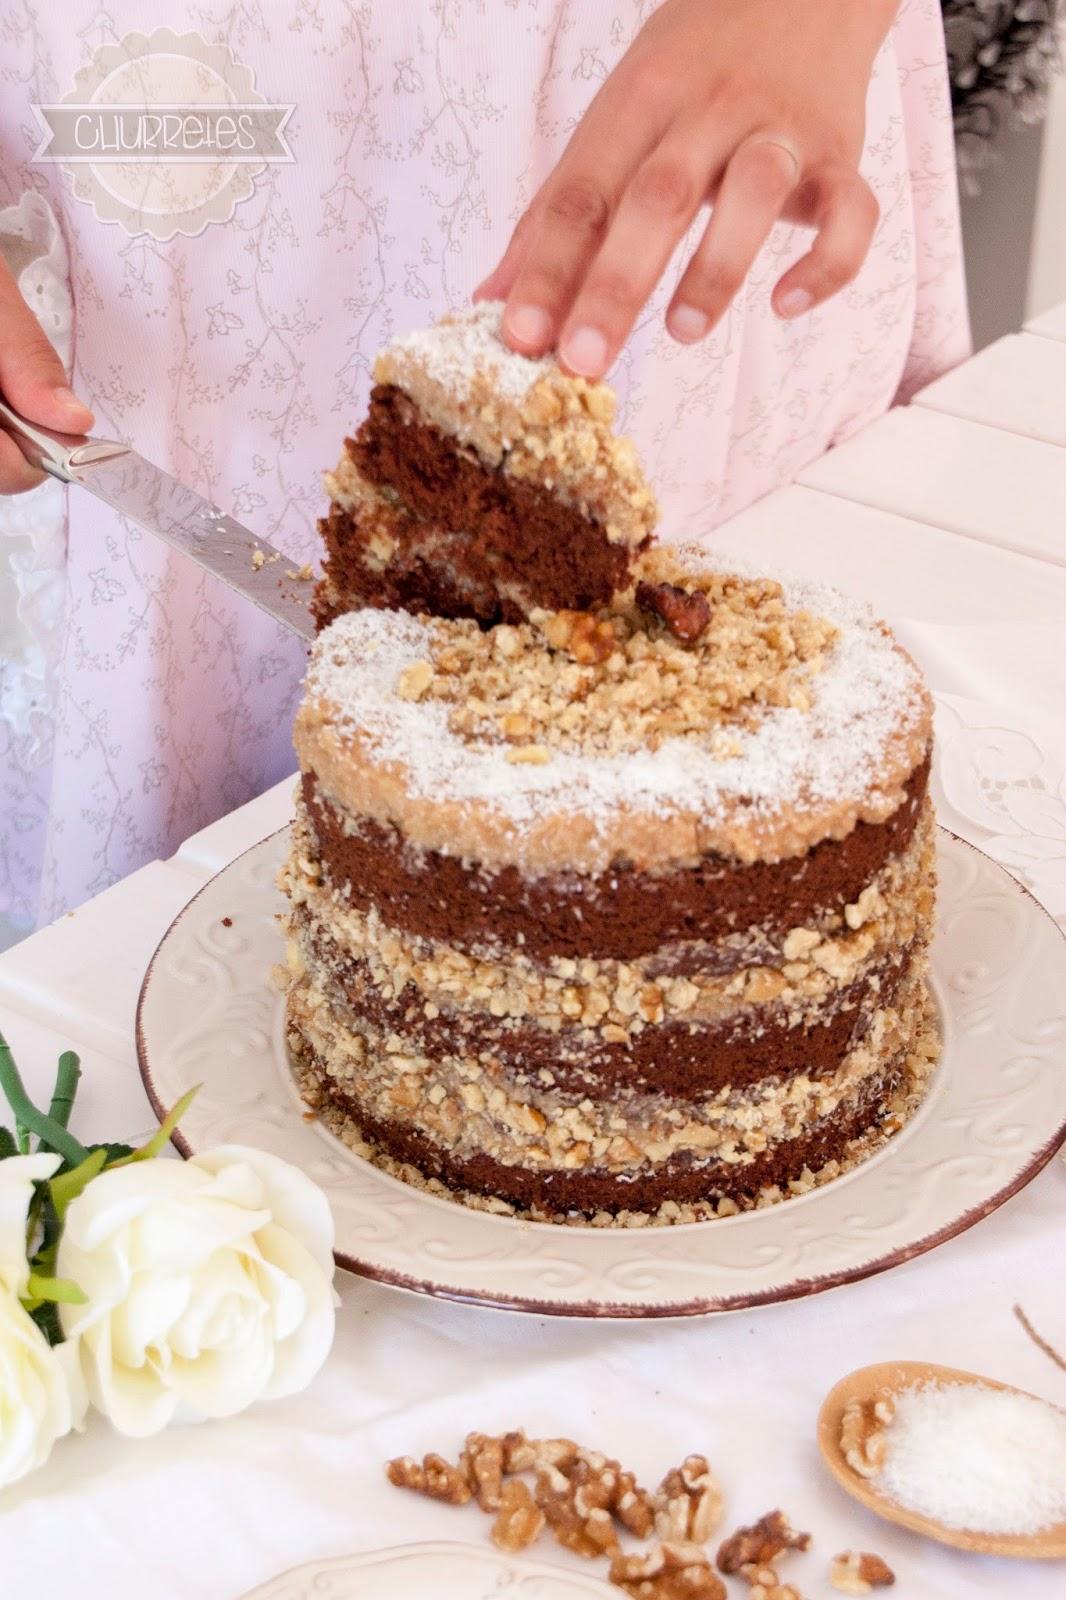 Churretes de Cocholate: GERMAN CHOCOLATE CAKE